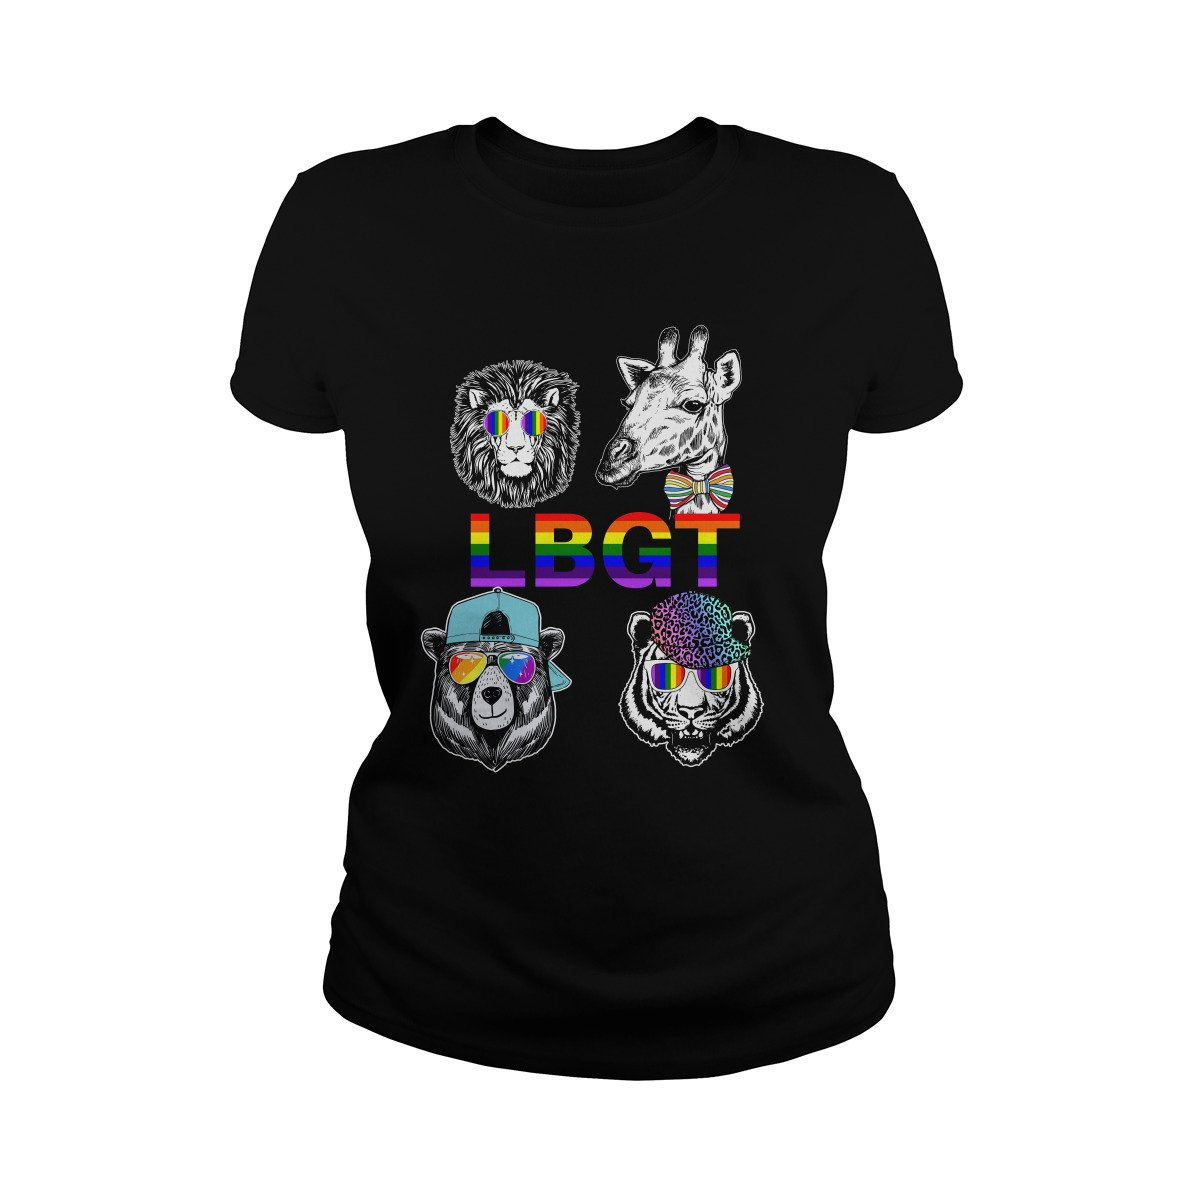 Lion Giraffe Bear Tiger Rainbow Style LGBT T-Shirt